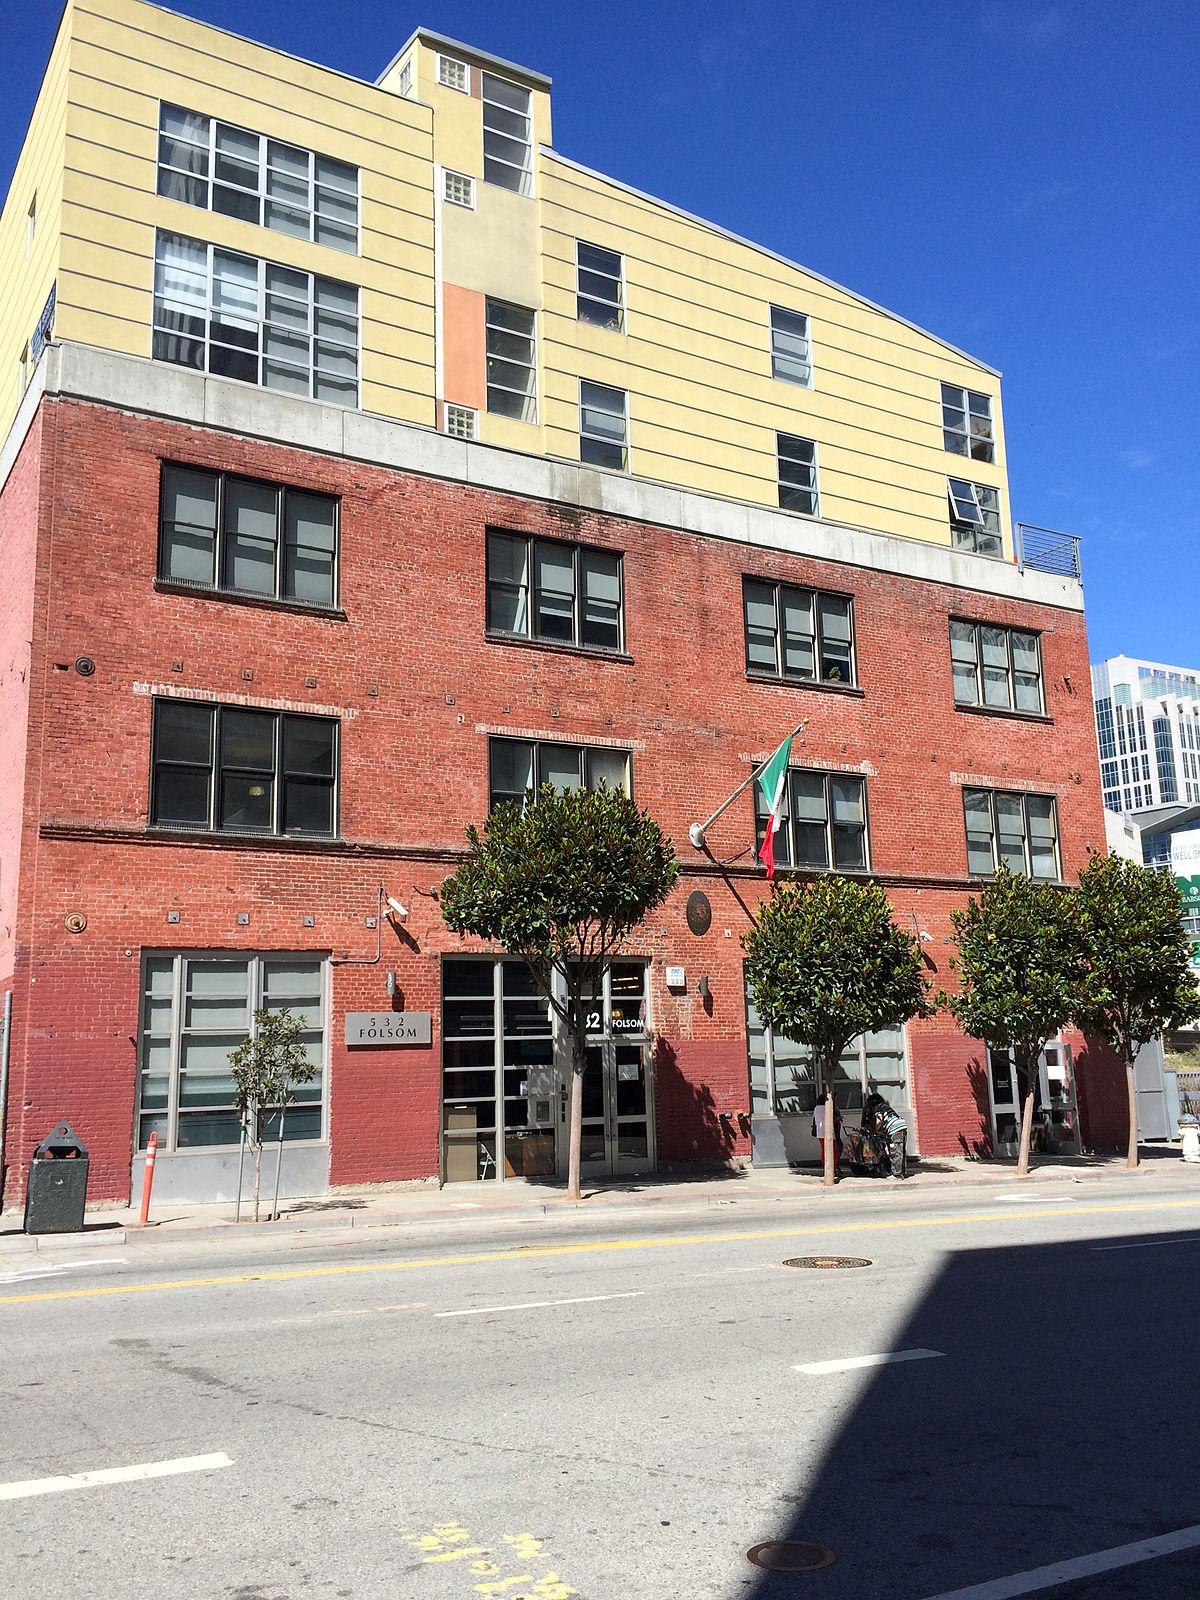 Consulate General Of Mexico, San Francisco